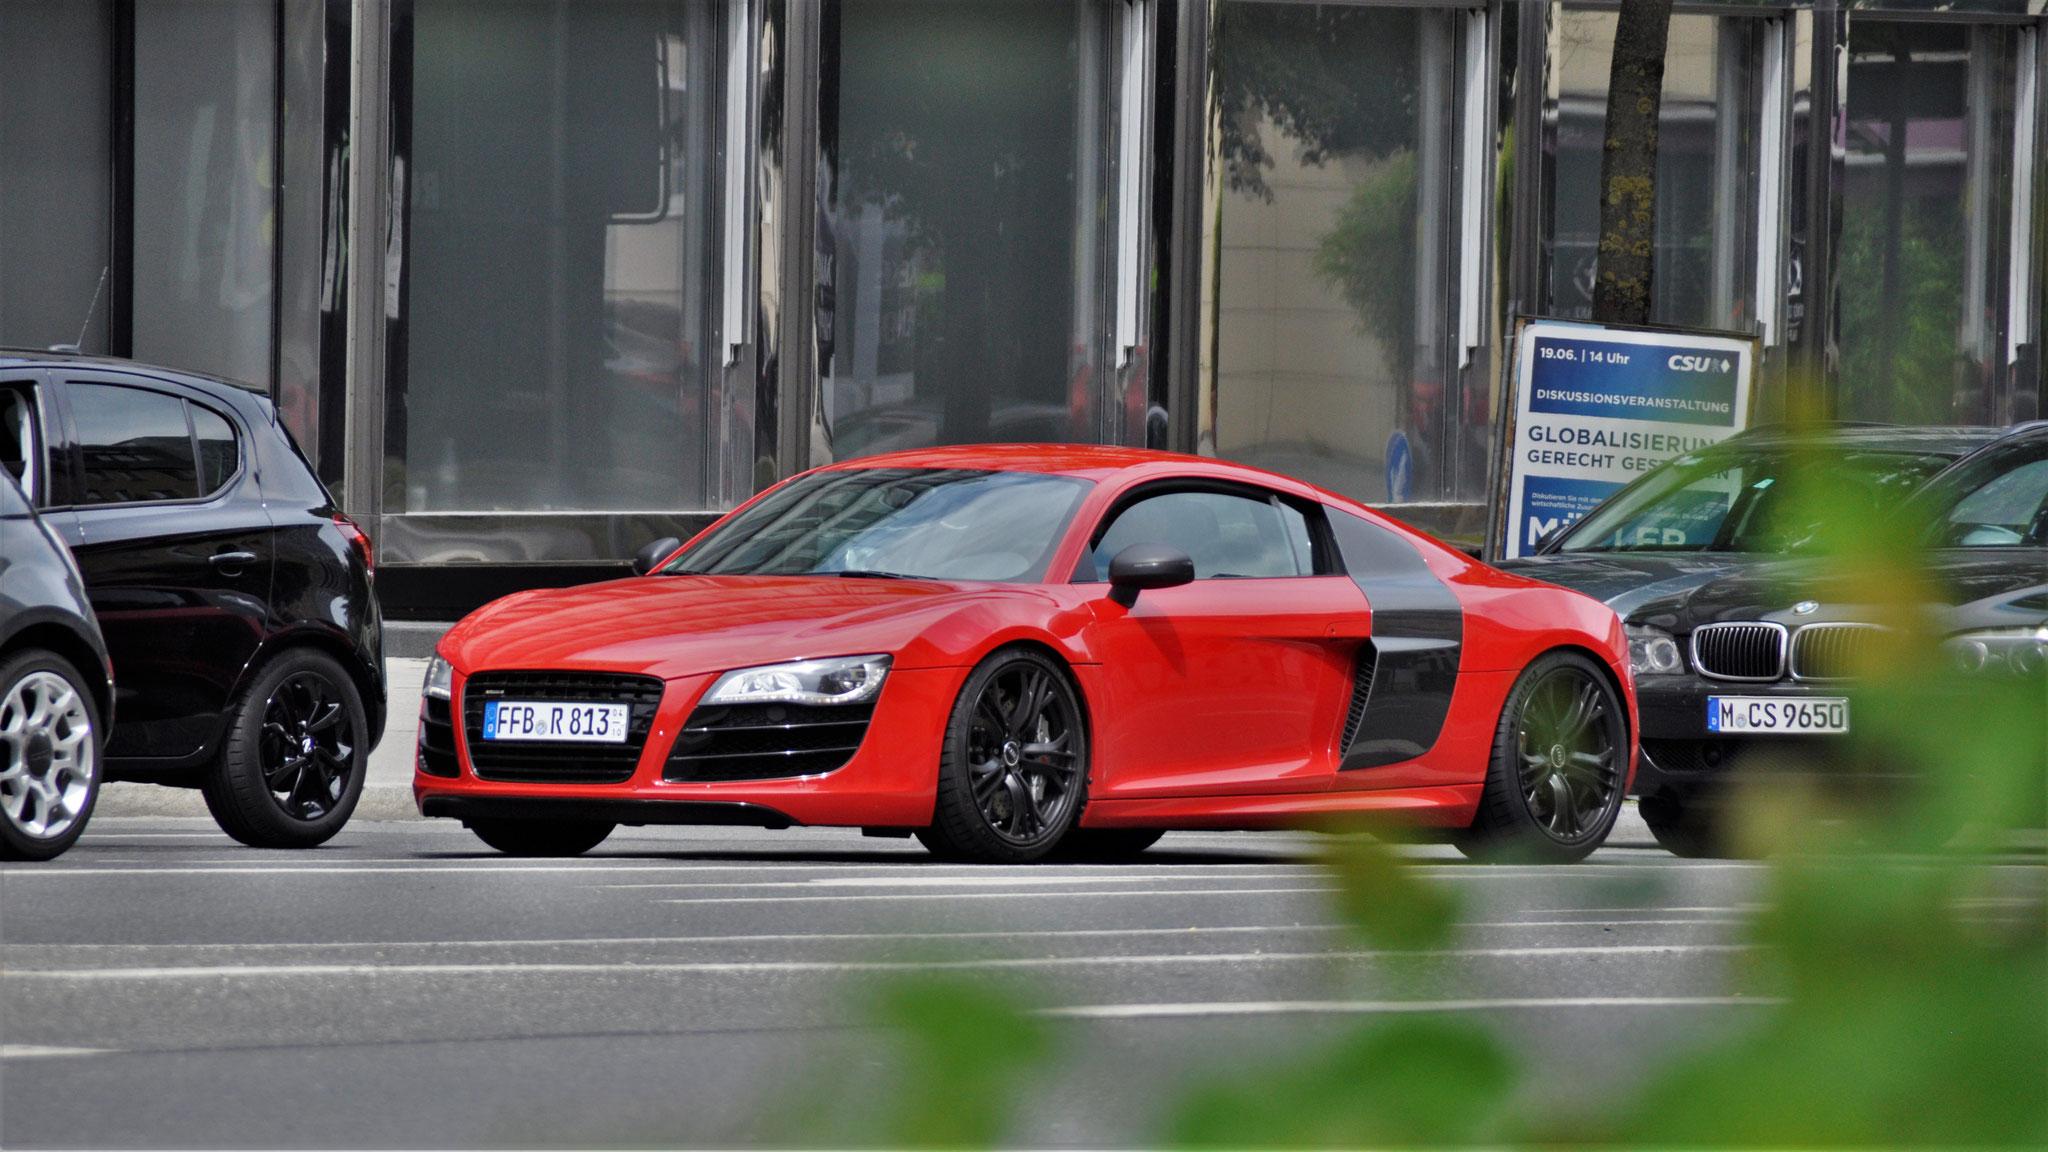 Audi R8 - FFB-R-813